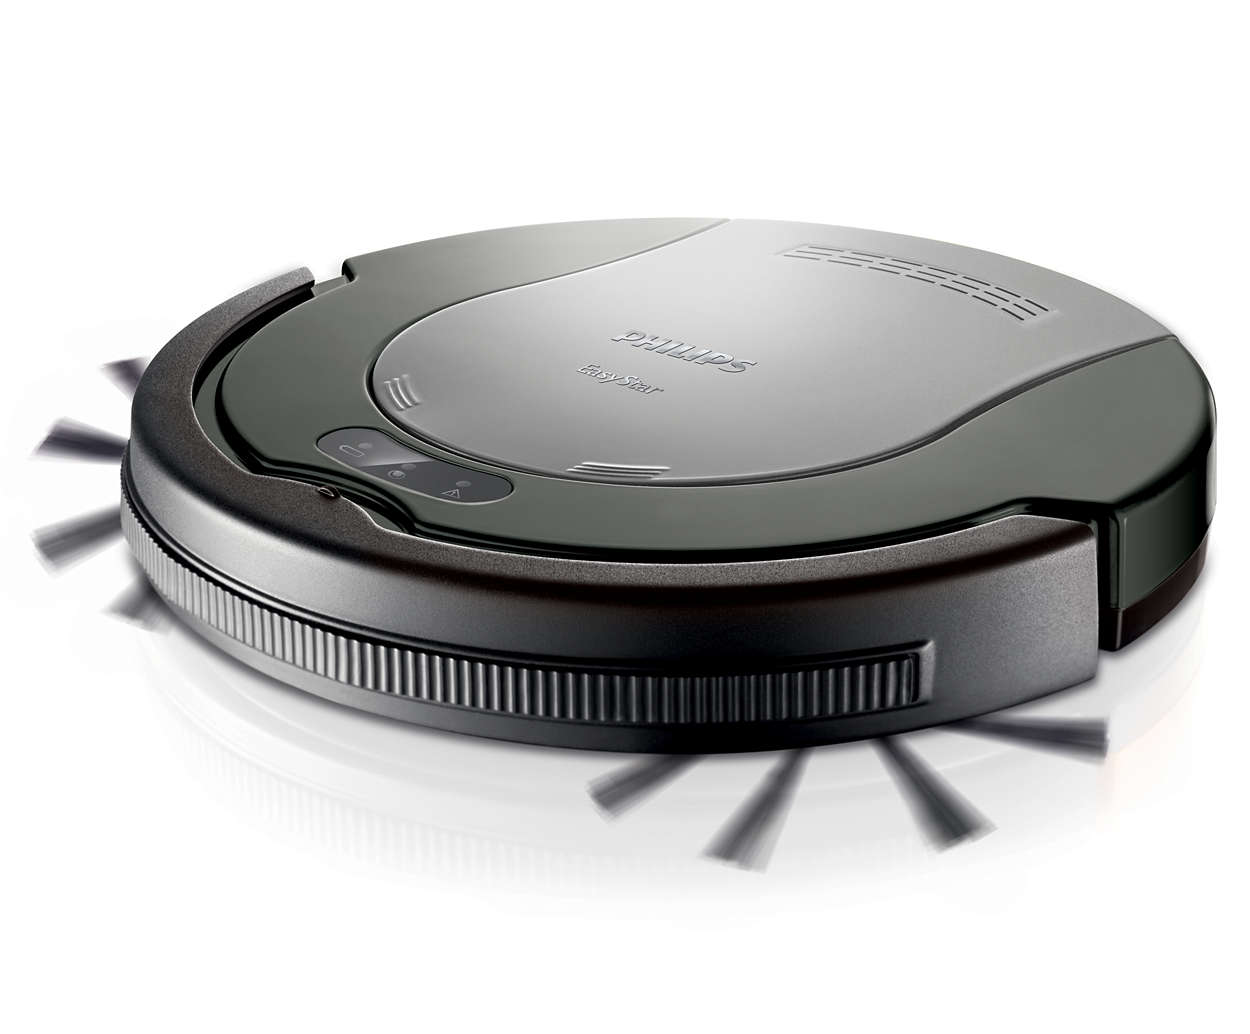 Den slankeste robotstøvsuger